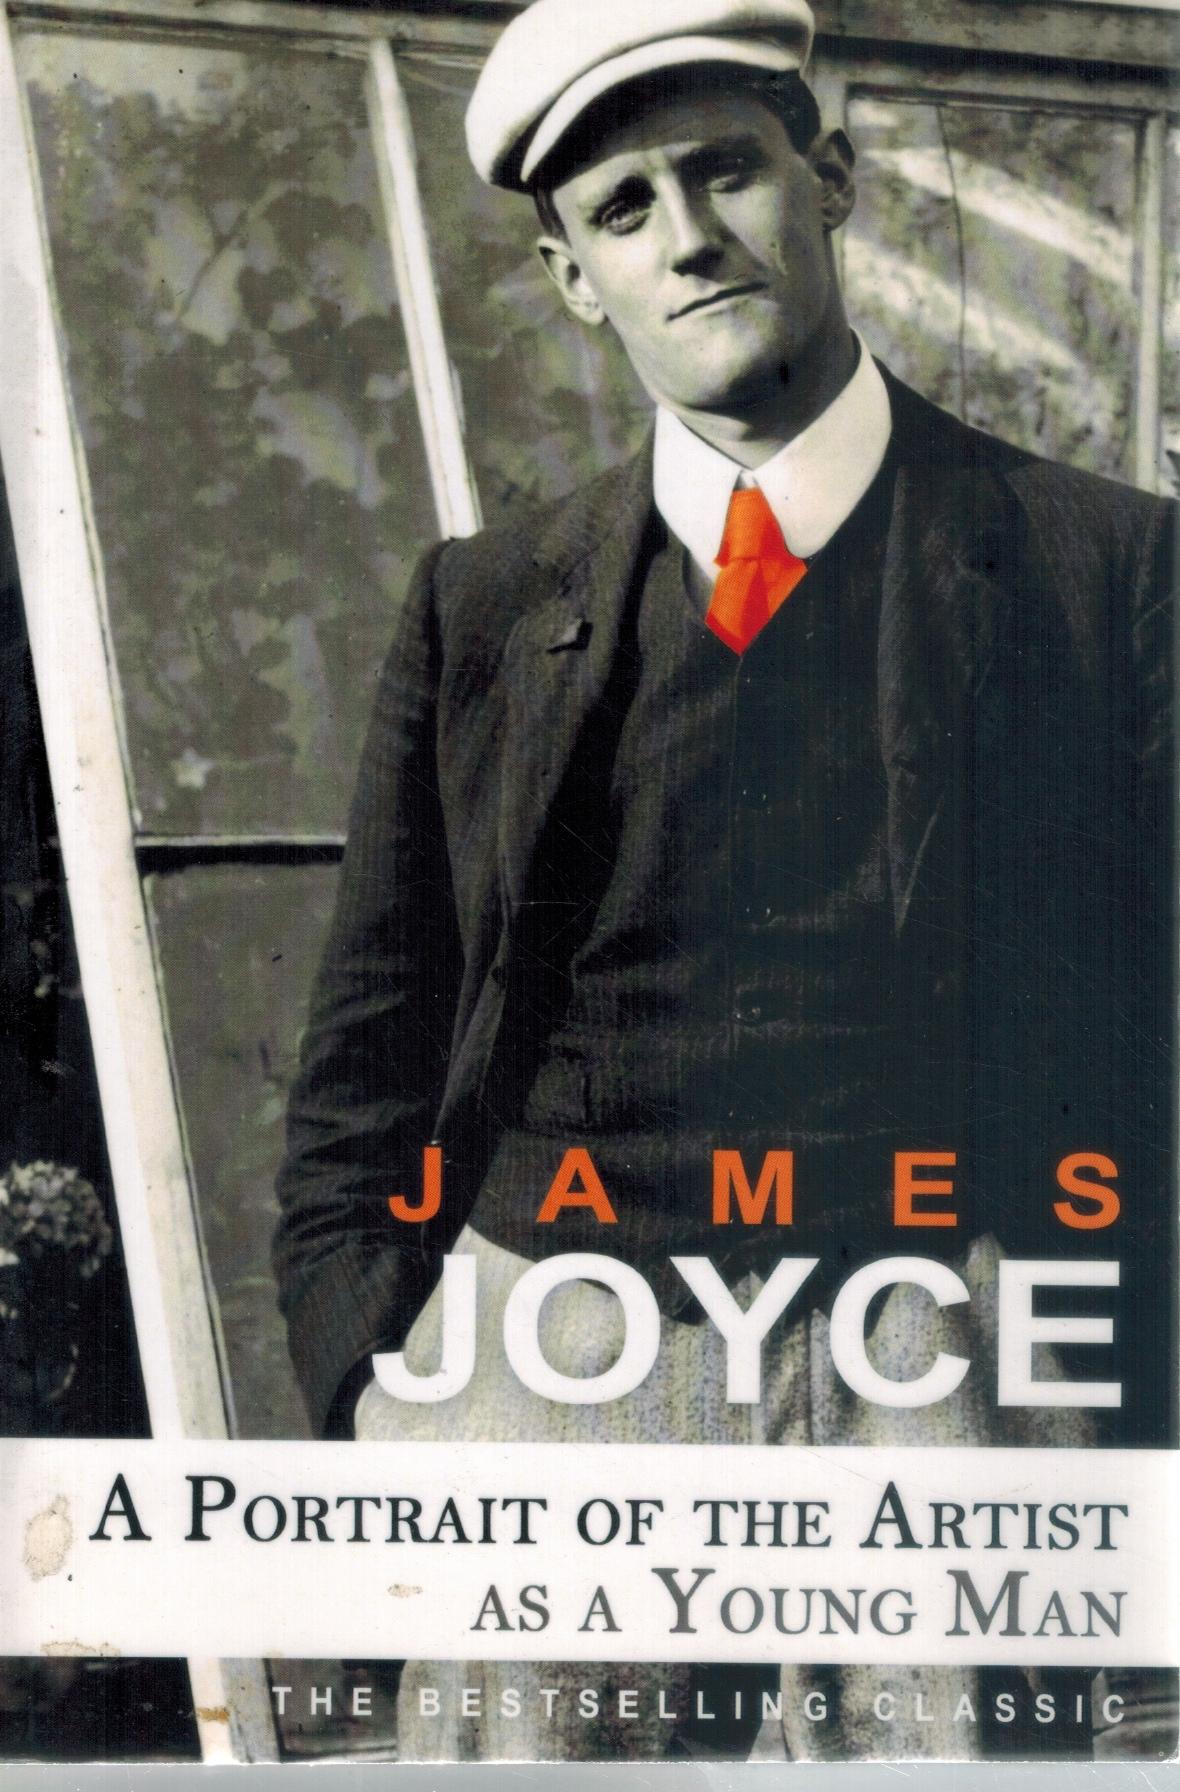 A PORTRAIT OF THE ARTIST AS A: Joyce, James